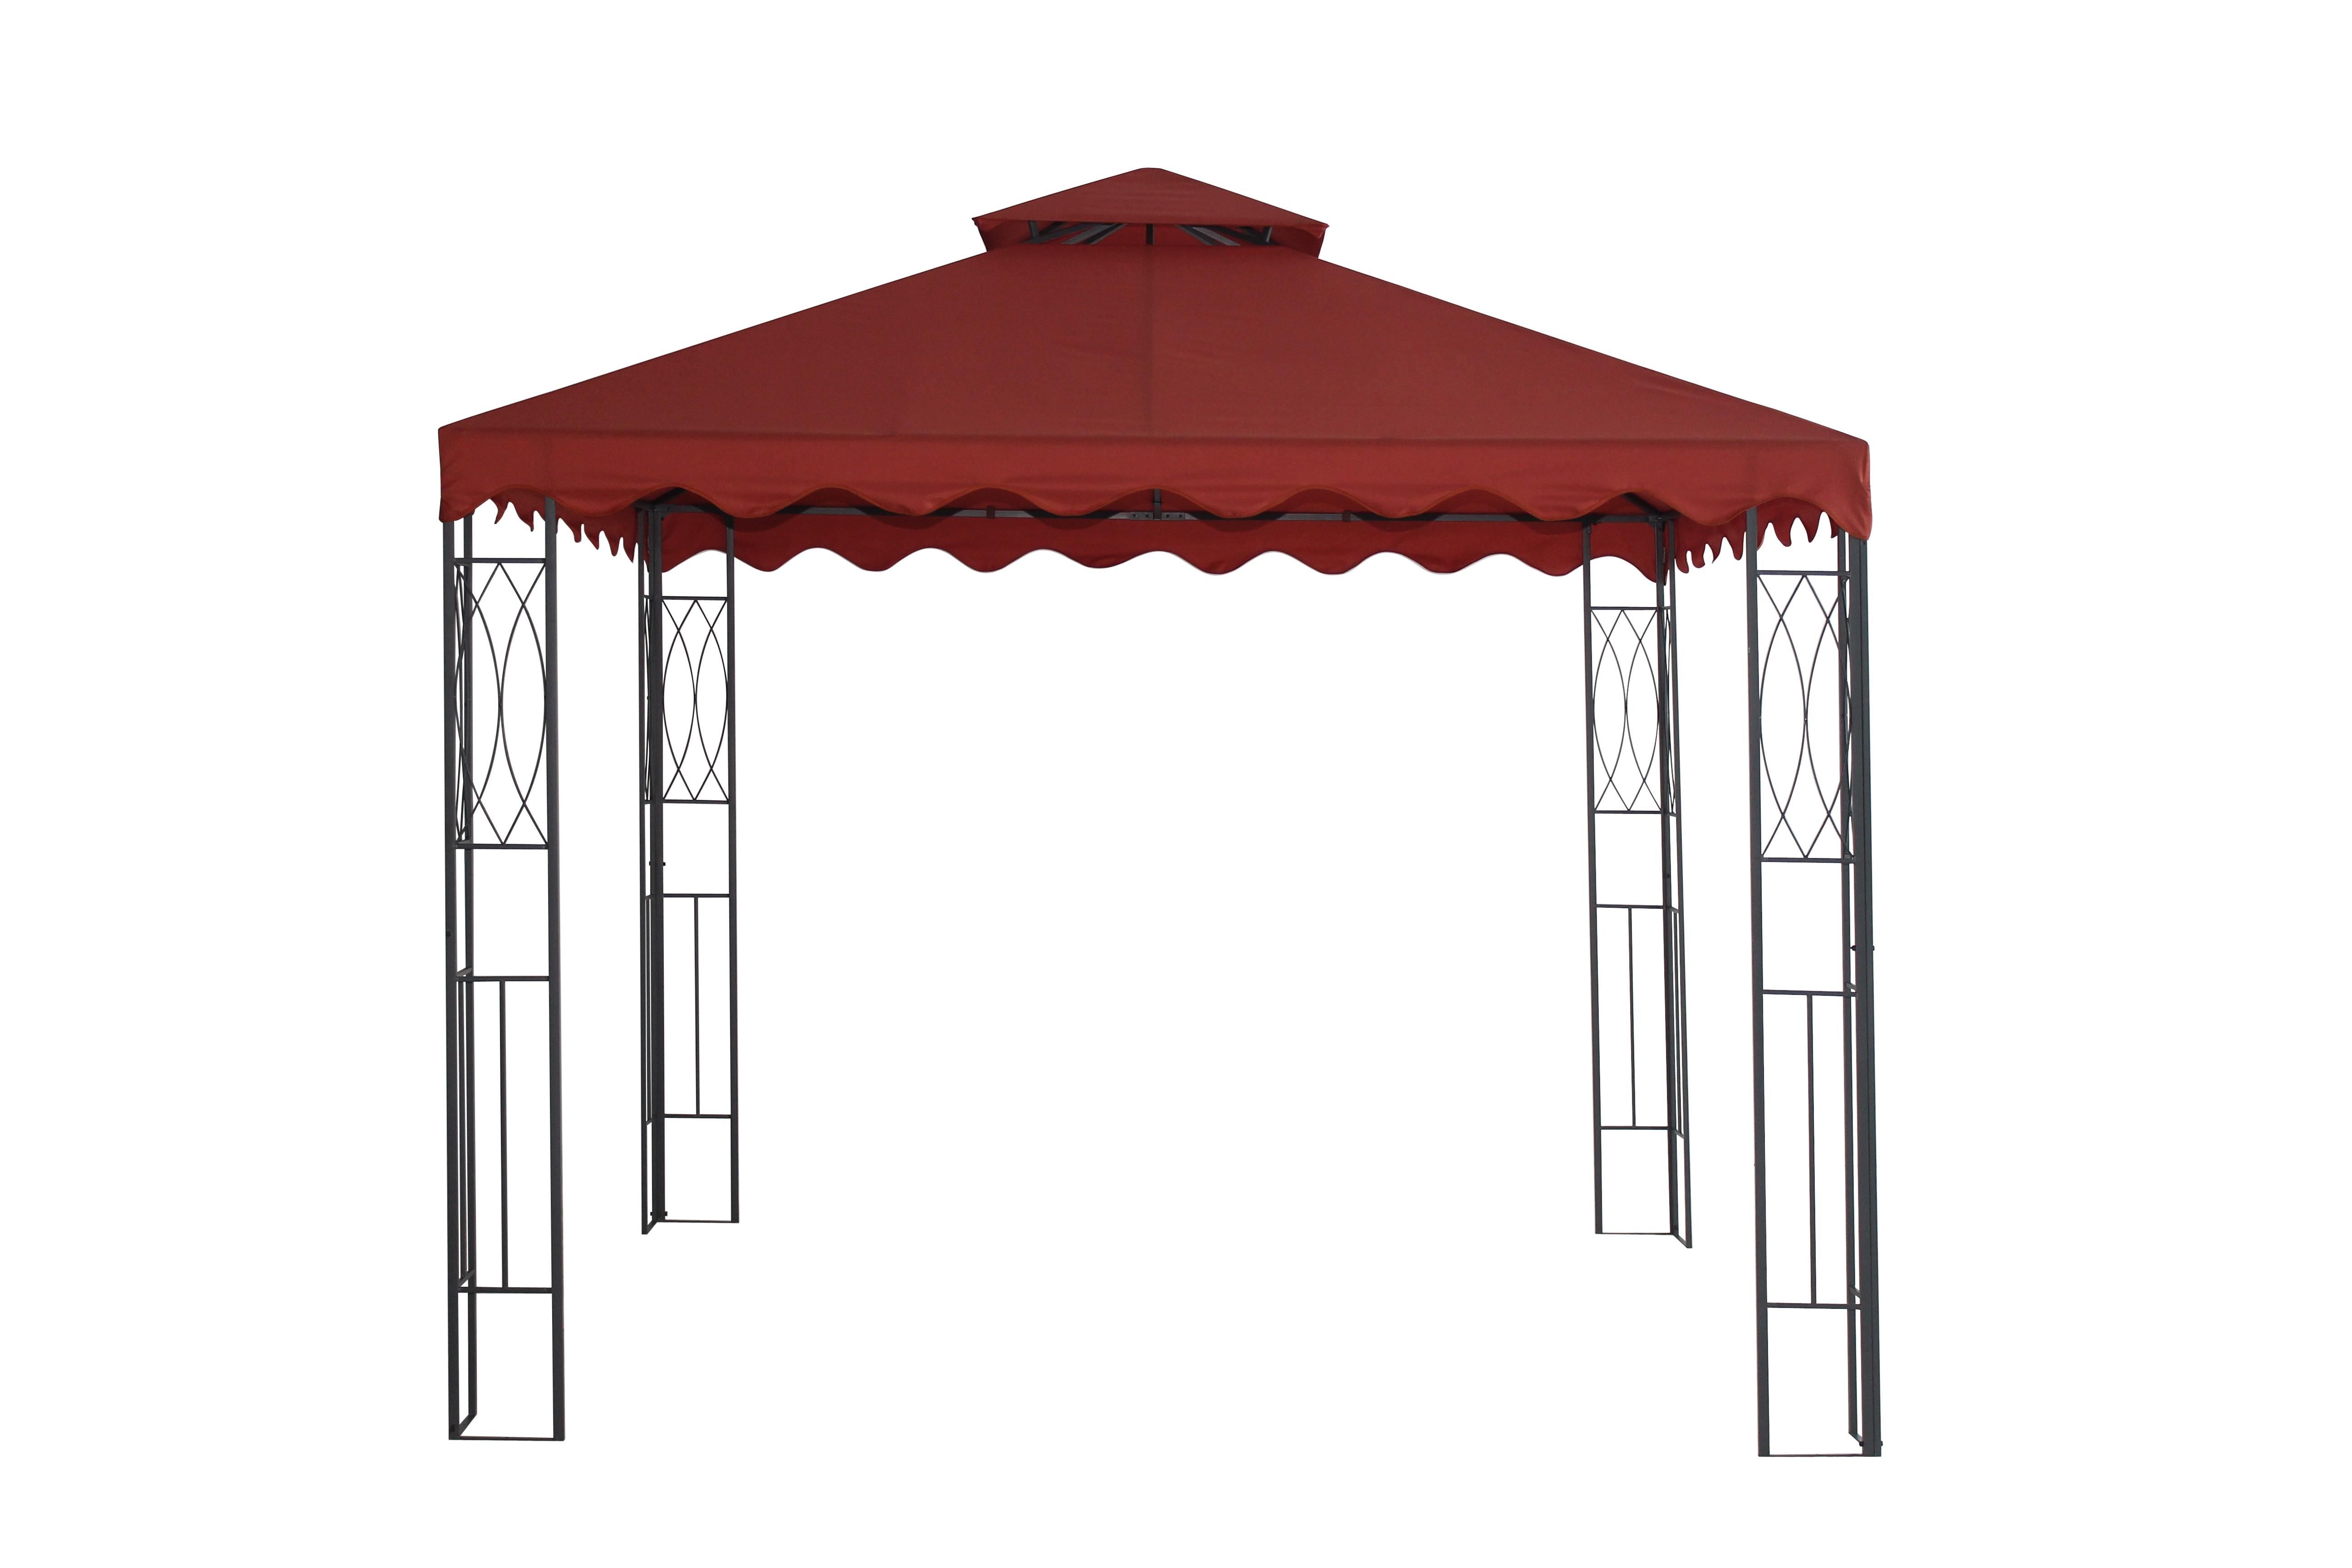 Dedeman Pavilion Gradina Patrat Cadru Metalic Poliamida Rosu 3 X 3 M Dedicat Planurilor Tale